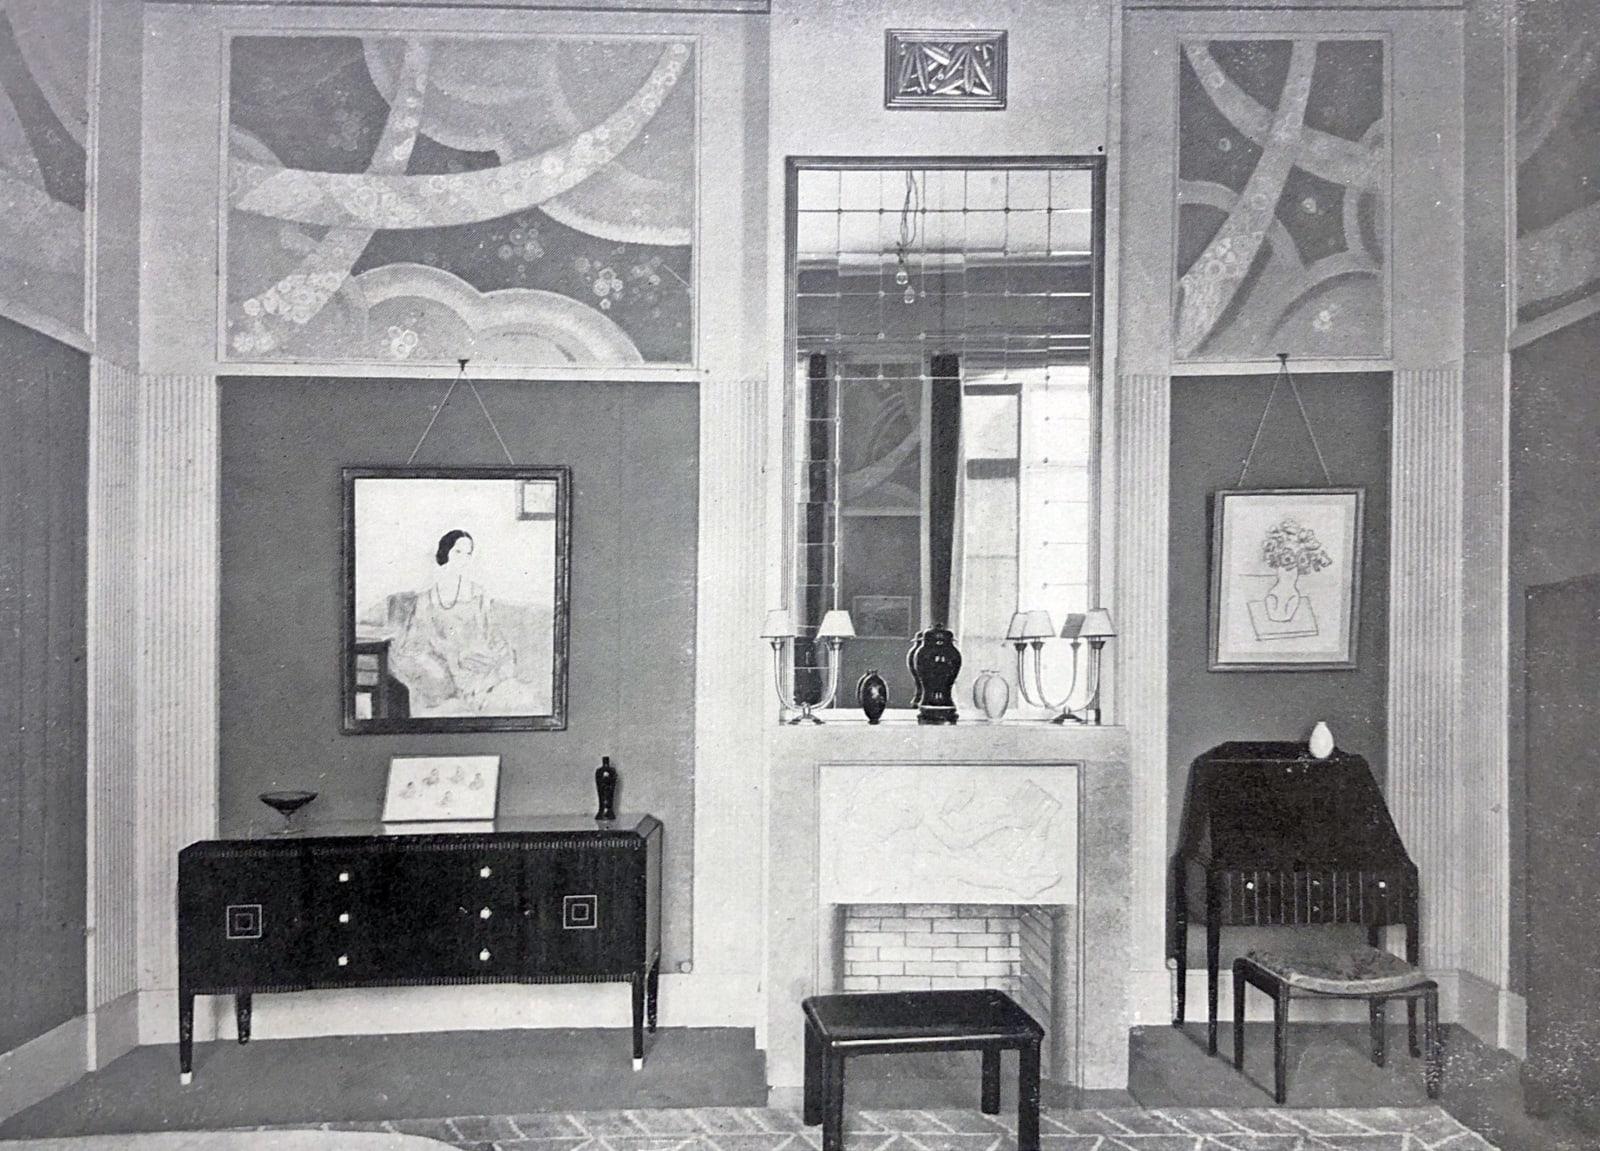 Art Deco master bedroom by DIM. Paris, 1925